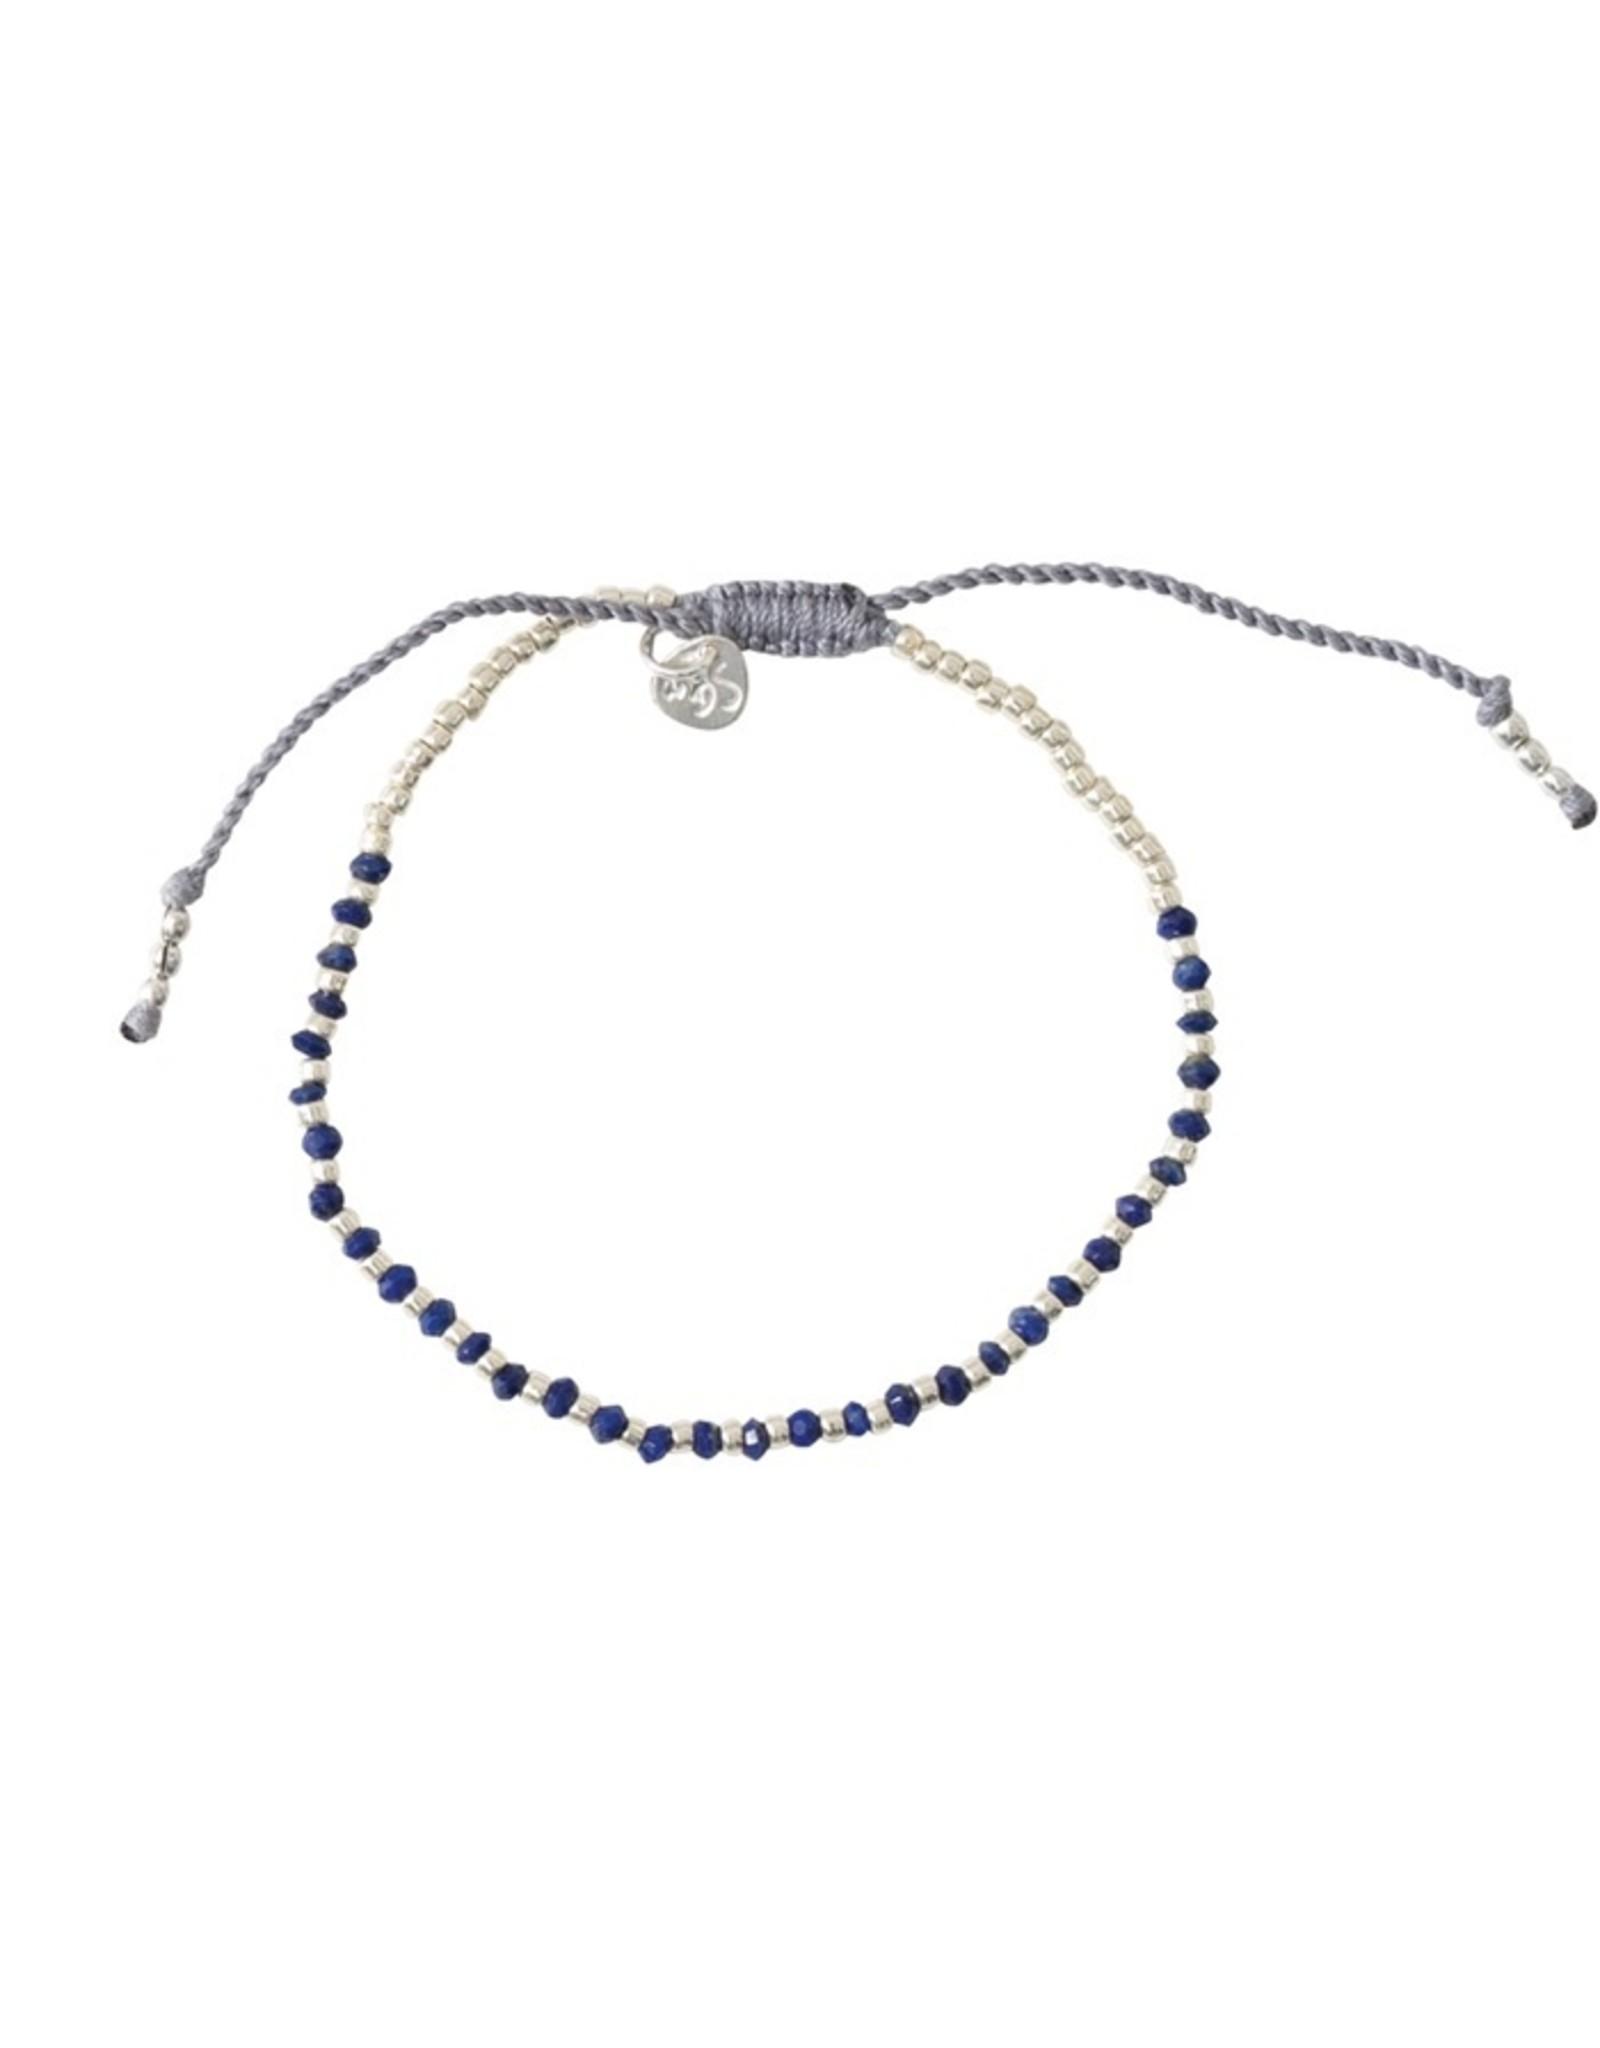 A beautiful Story Beautiful Silver Plated Bracelet